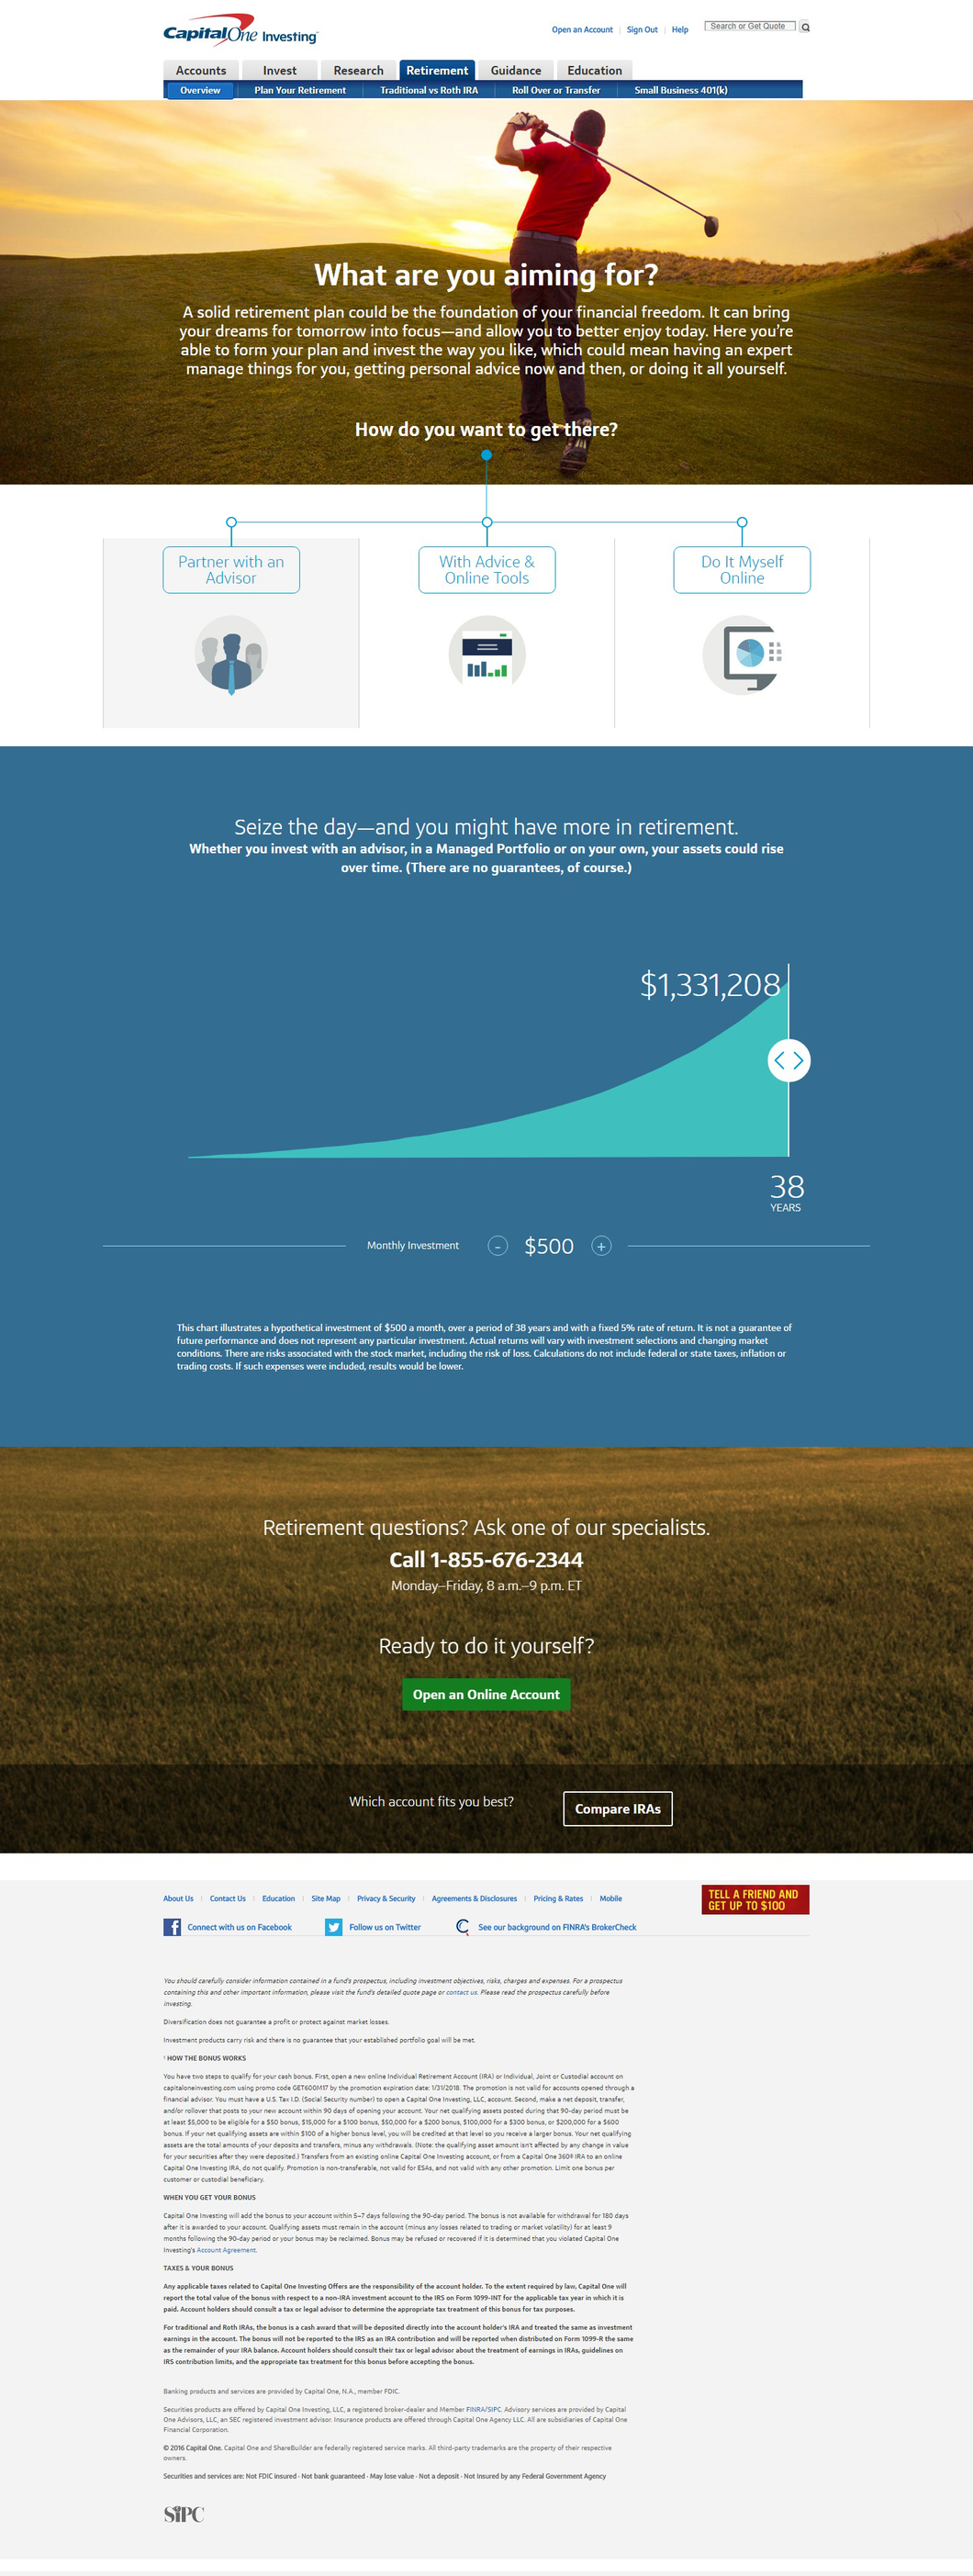 Capital One Investing Platform Walkthrough | Investopedia